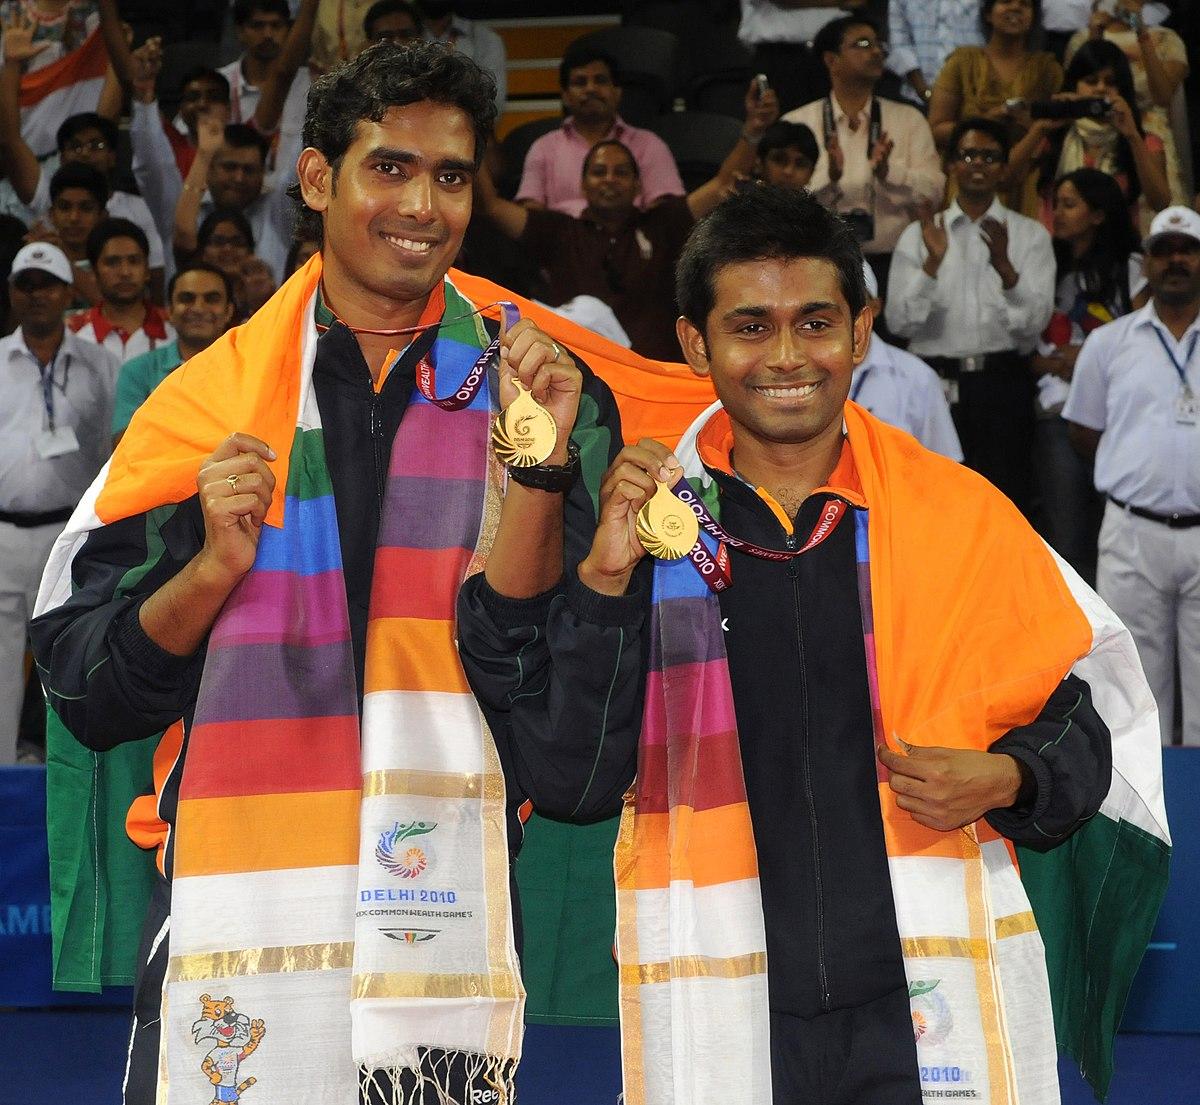 Sharath Kamal Achanta won gold in common wealth